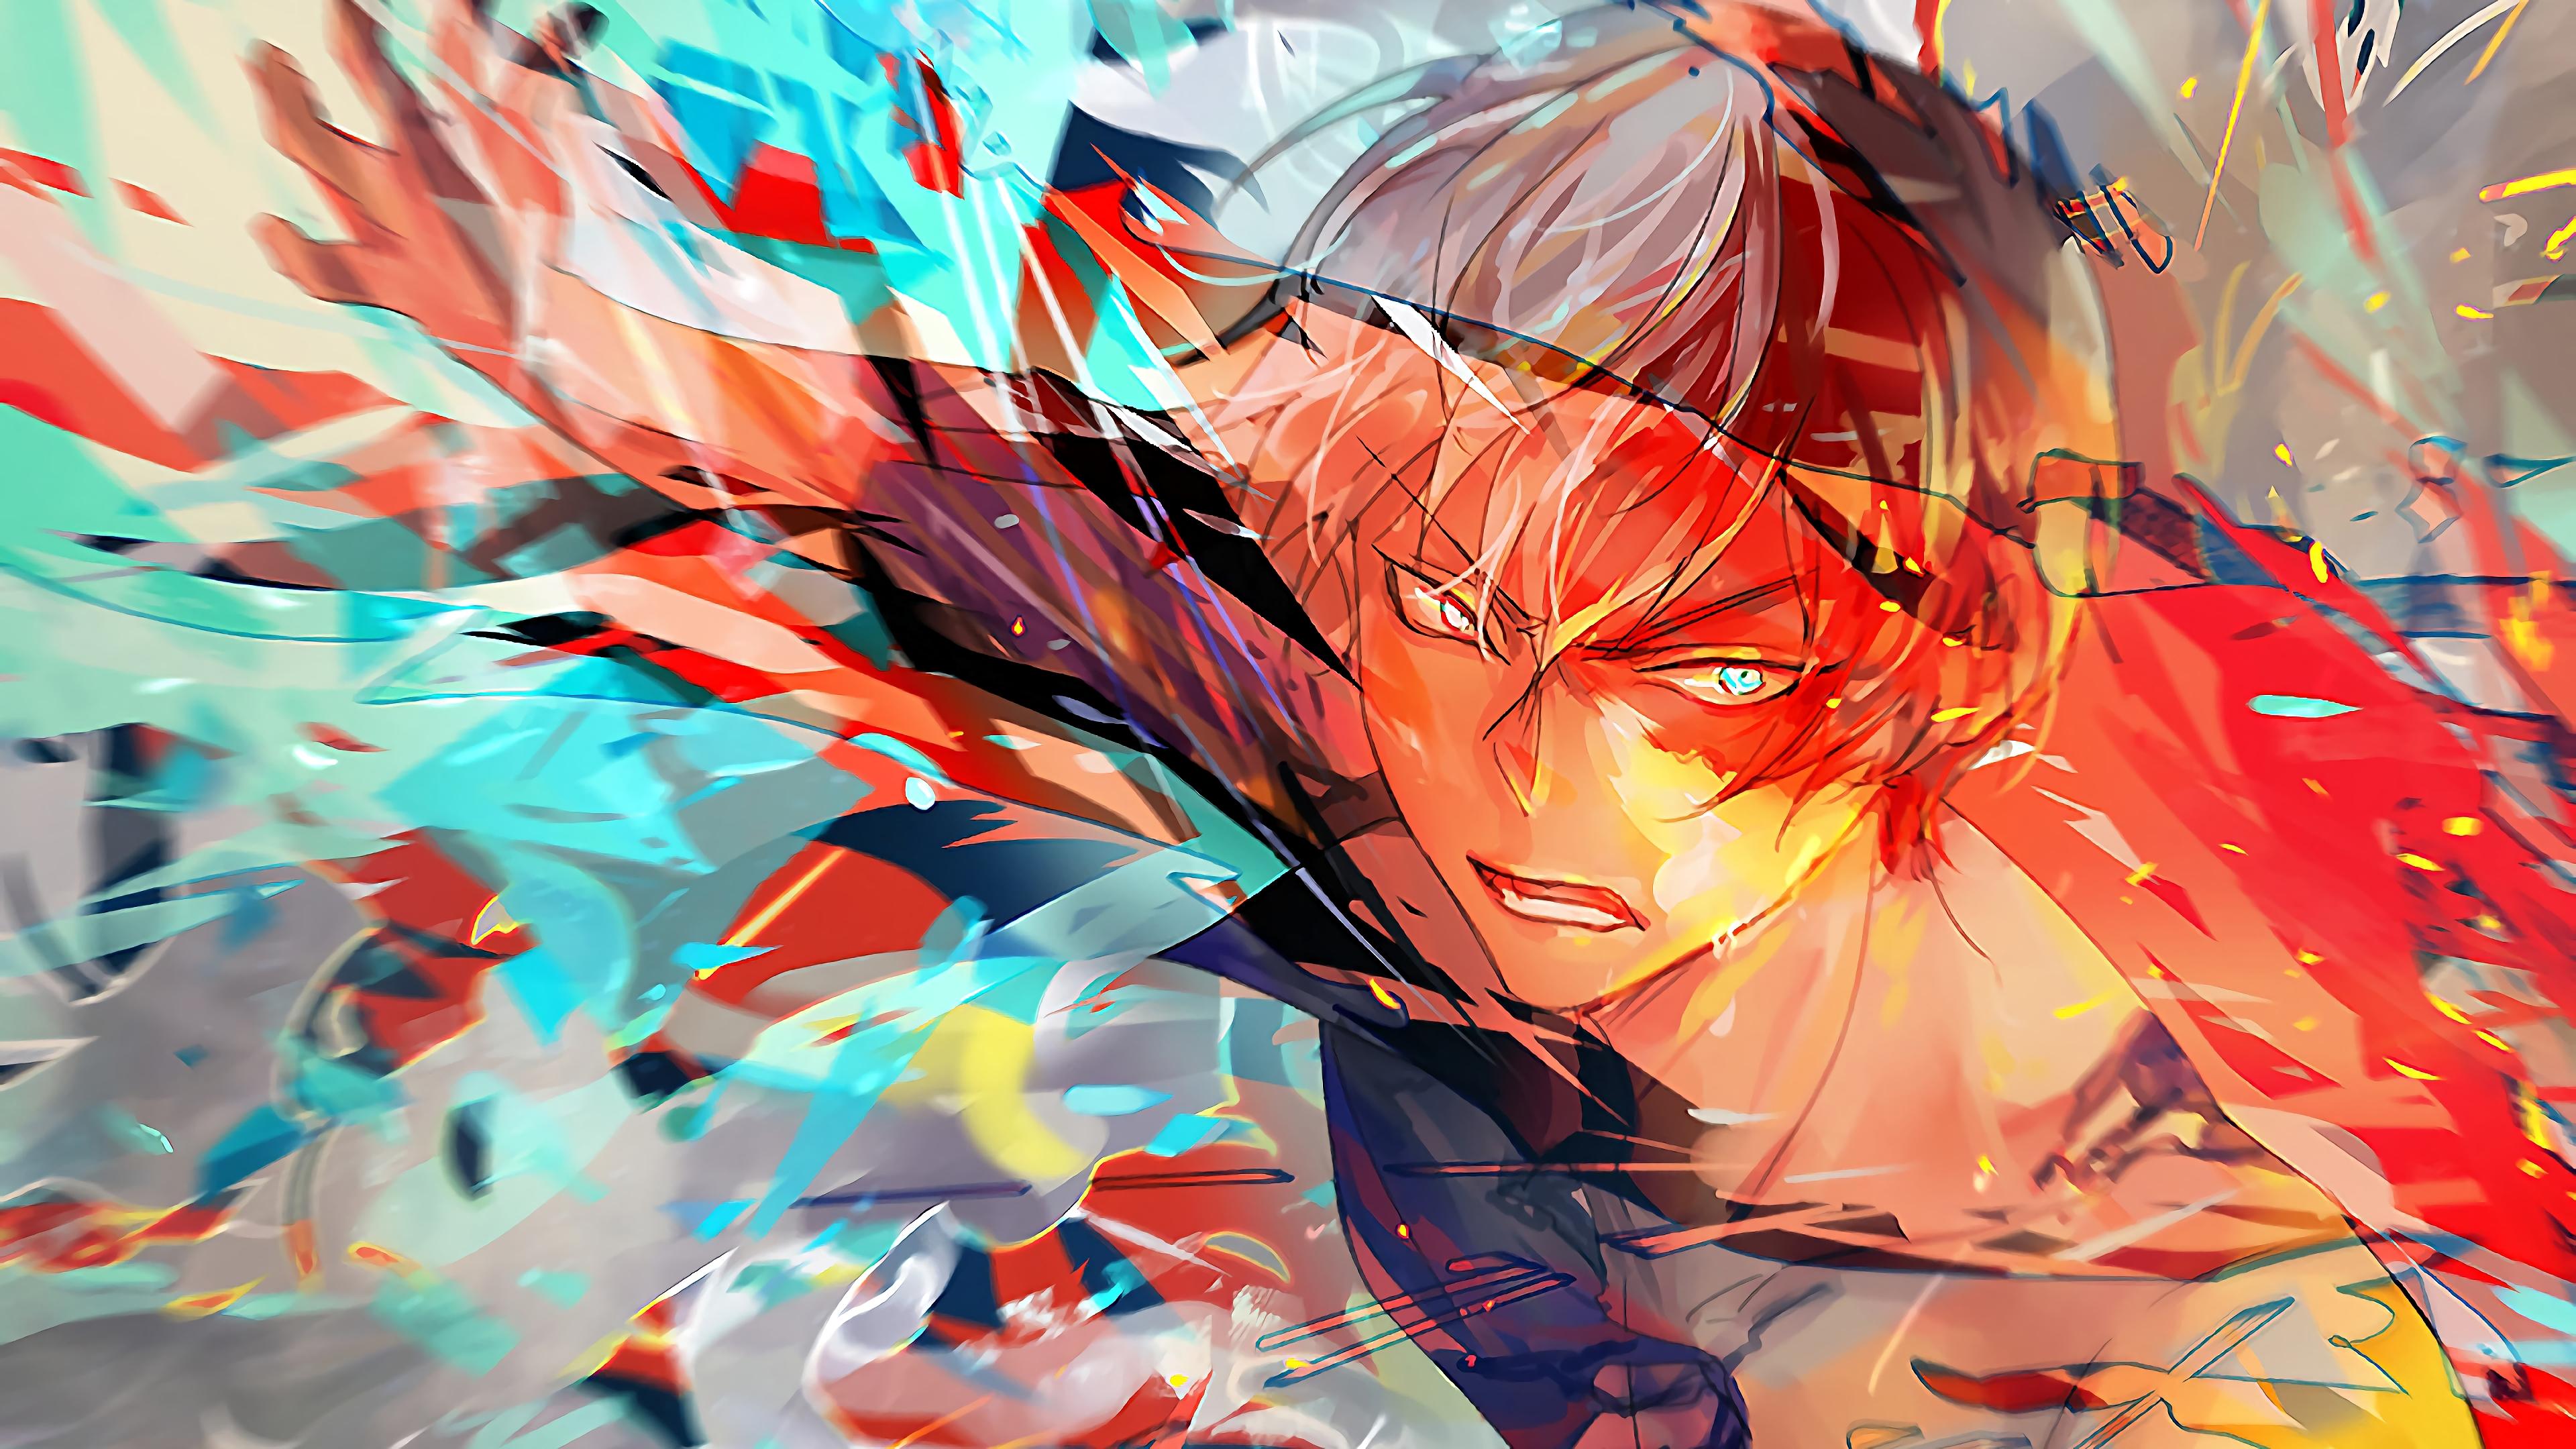 Shoto Todoroki My Hero Academia Hd Anime 4k Wallpapers Images